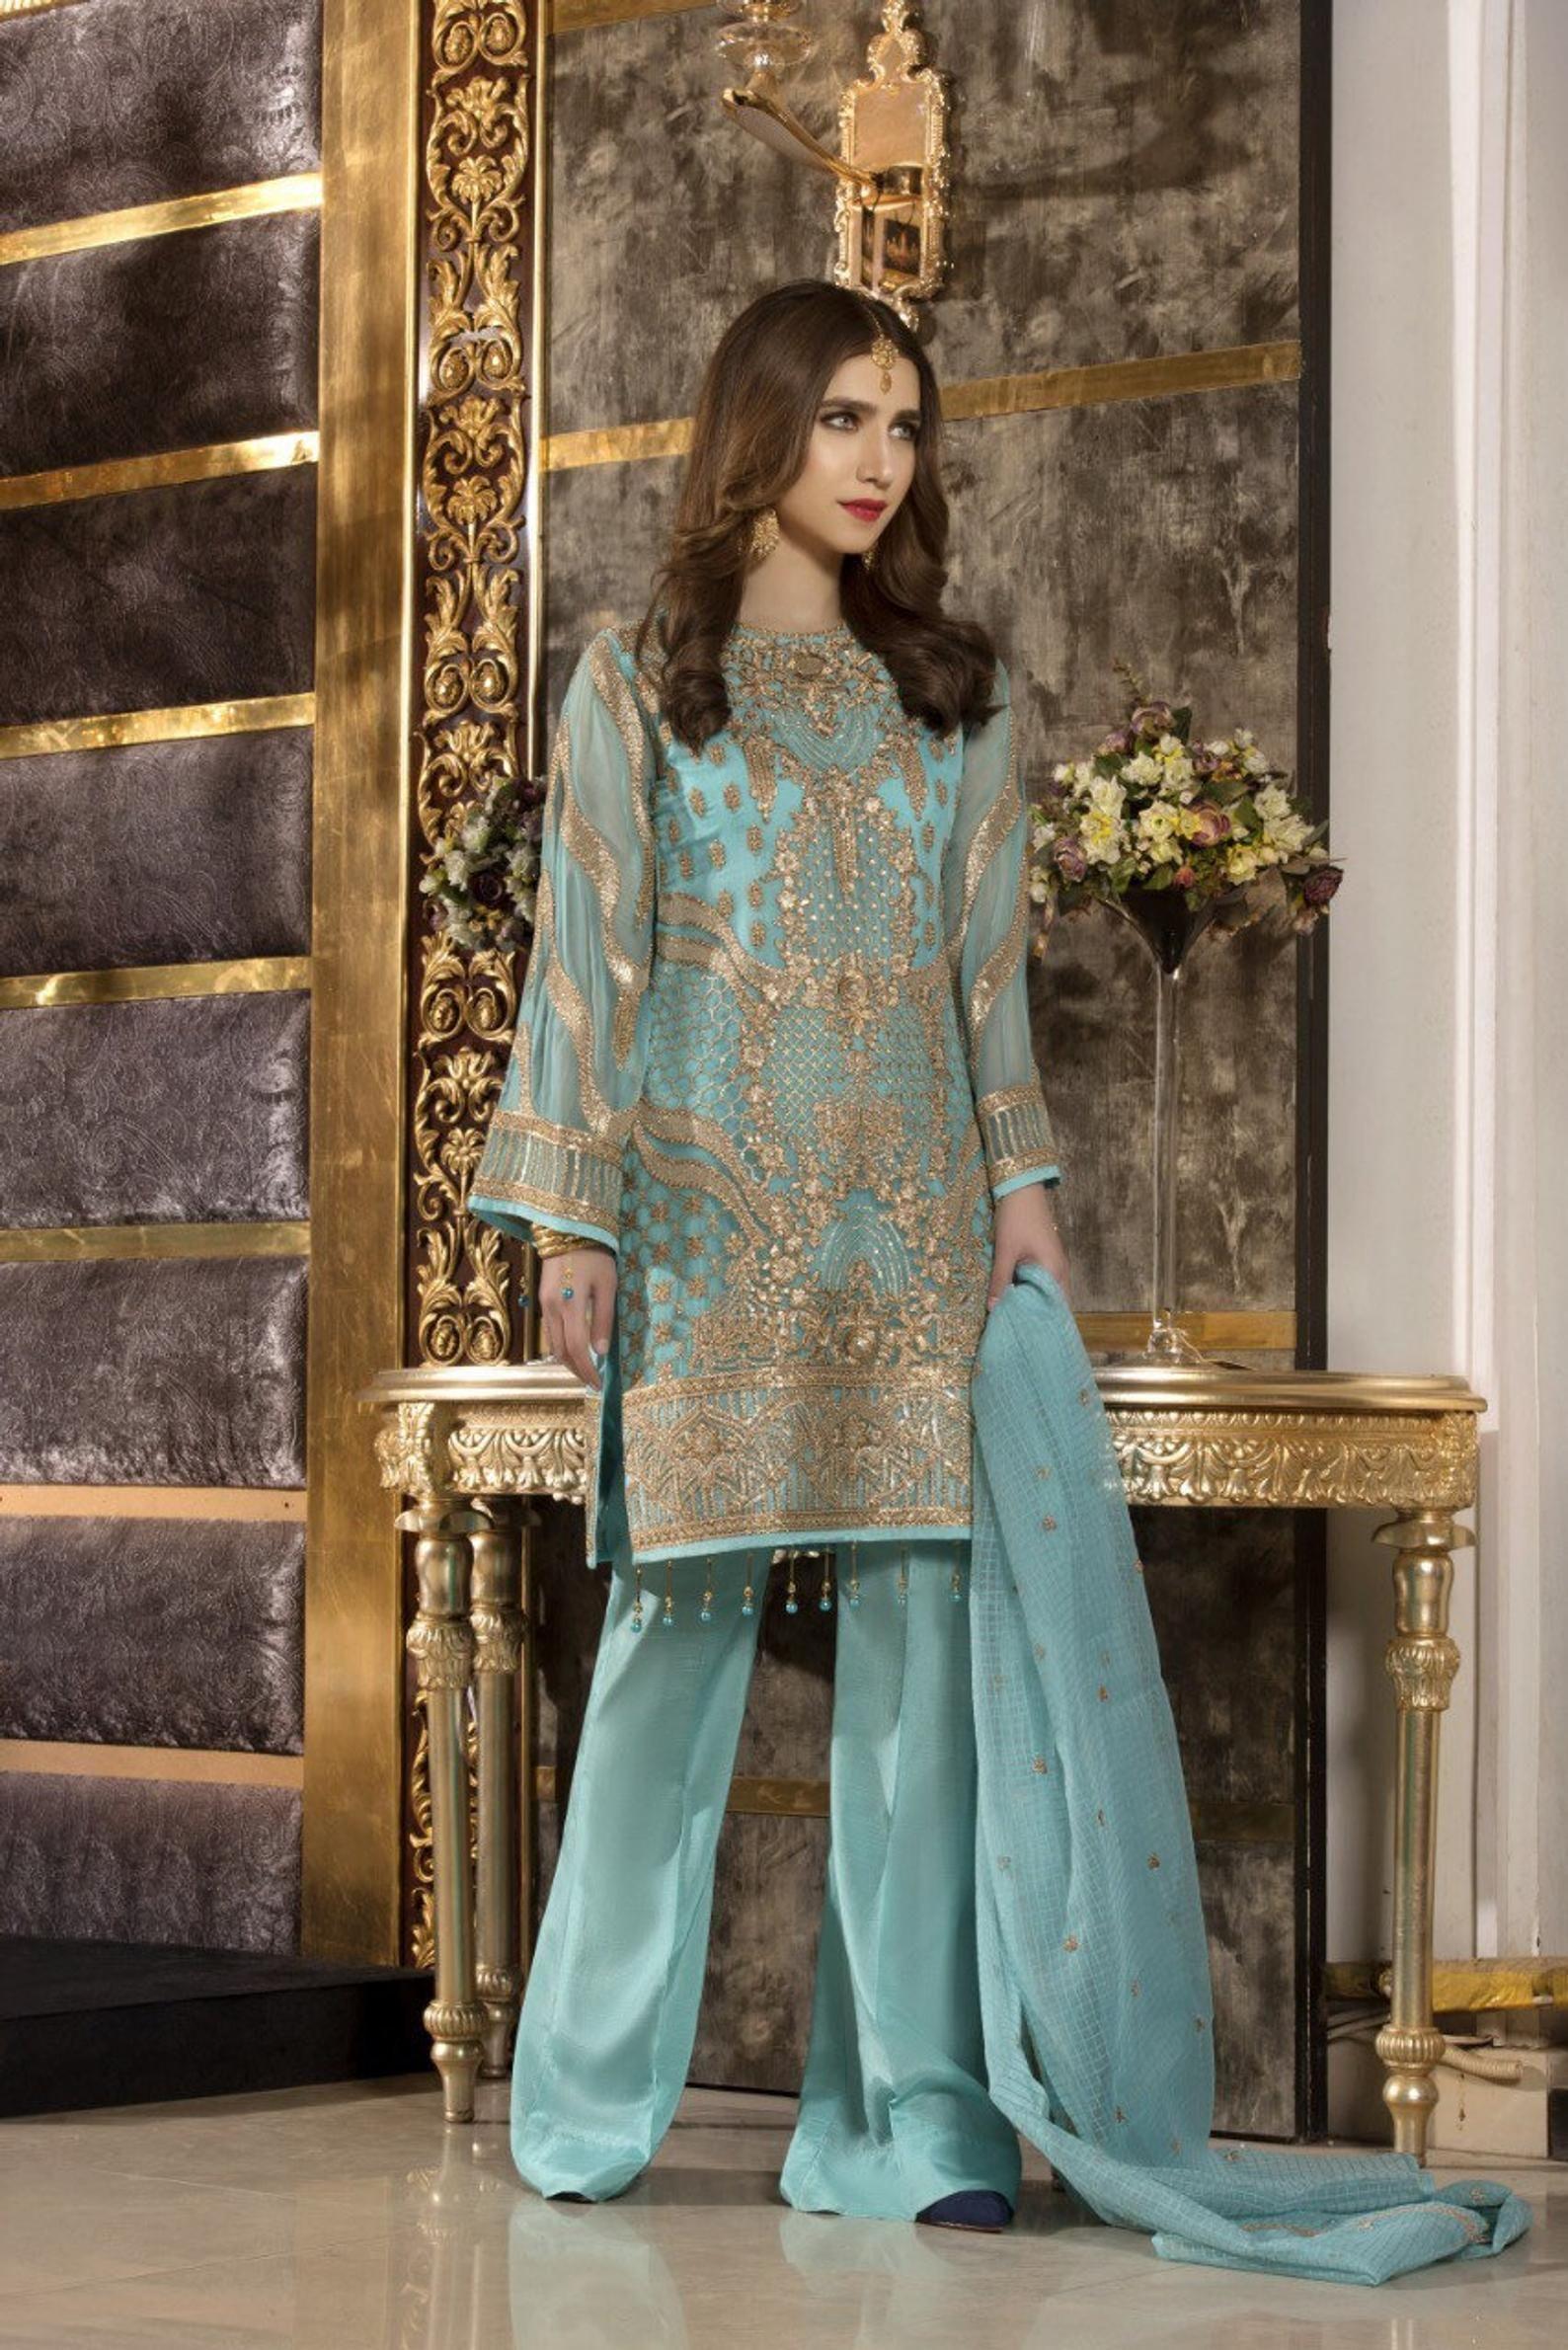 97a880e682 FAREESIA - Maryum N Maria Premium Luxury Chiffon Collection Suit in ...